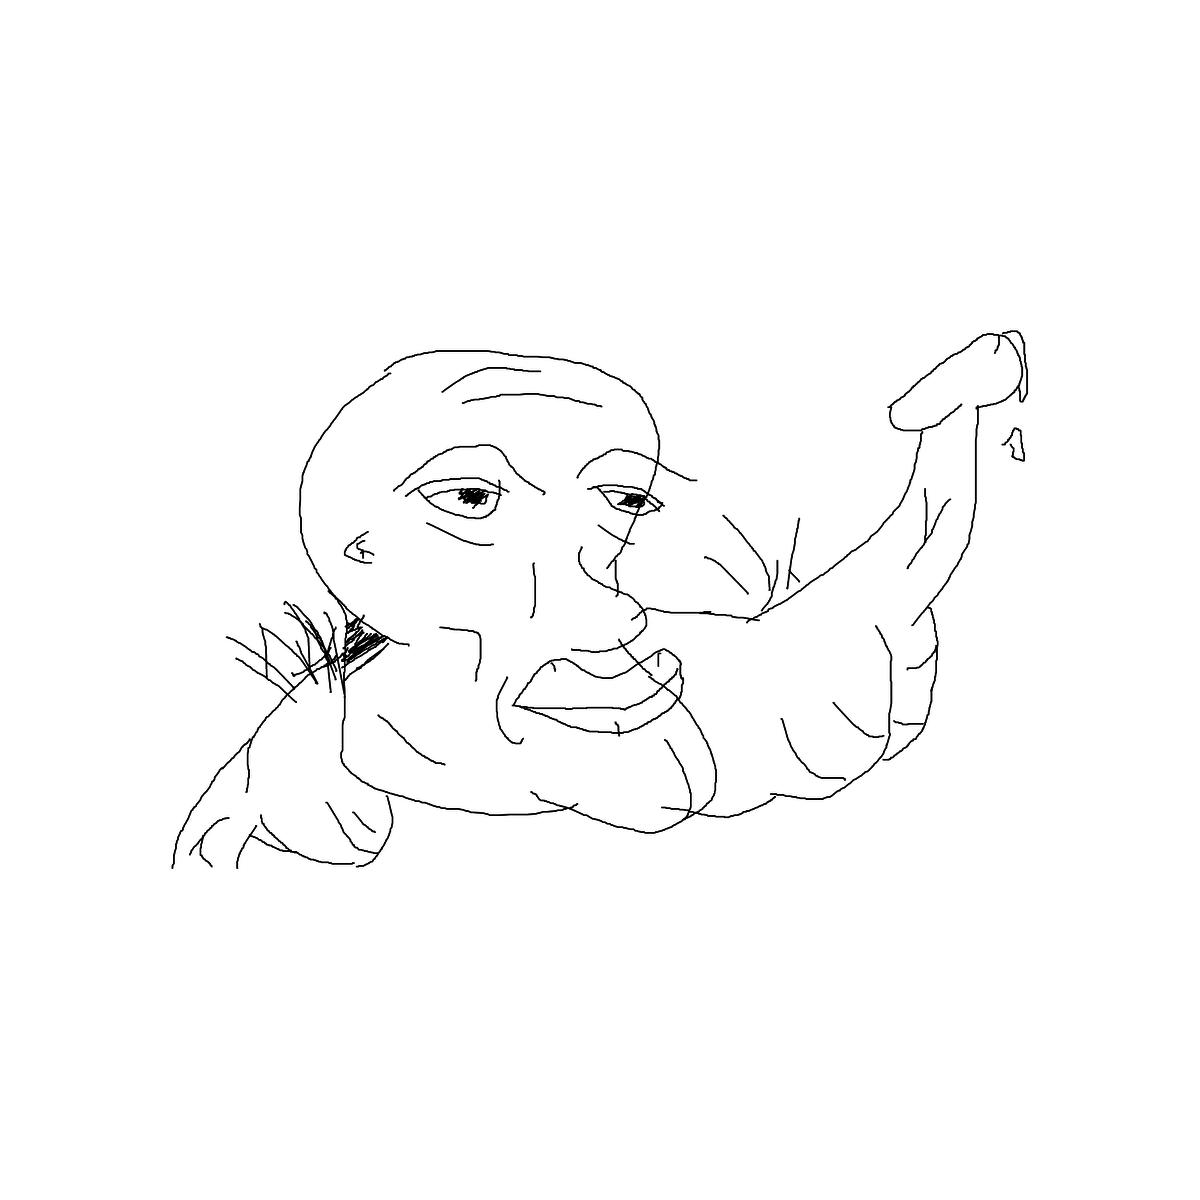 BAAAM drawing#5604 lat:32.3097419738769500lng: -102.4643630981445300